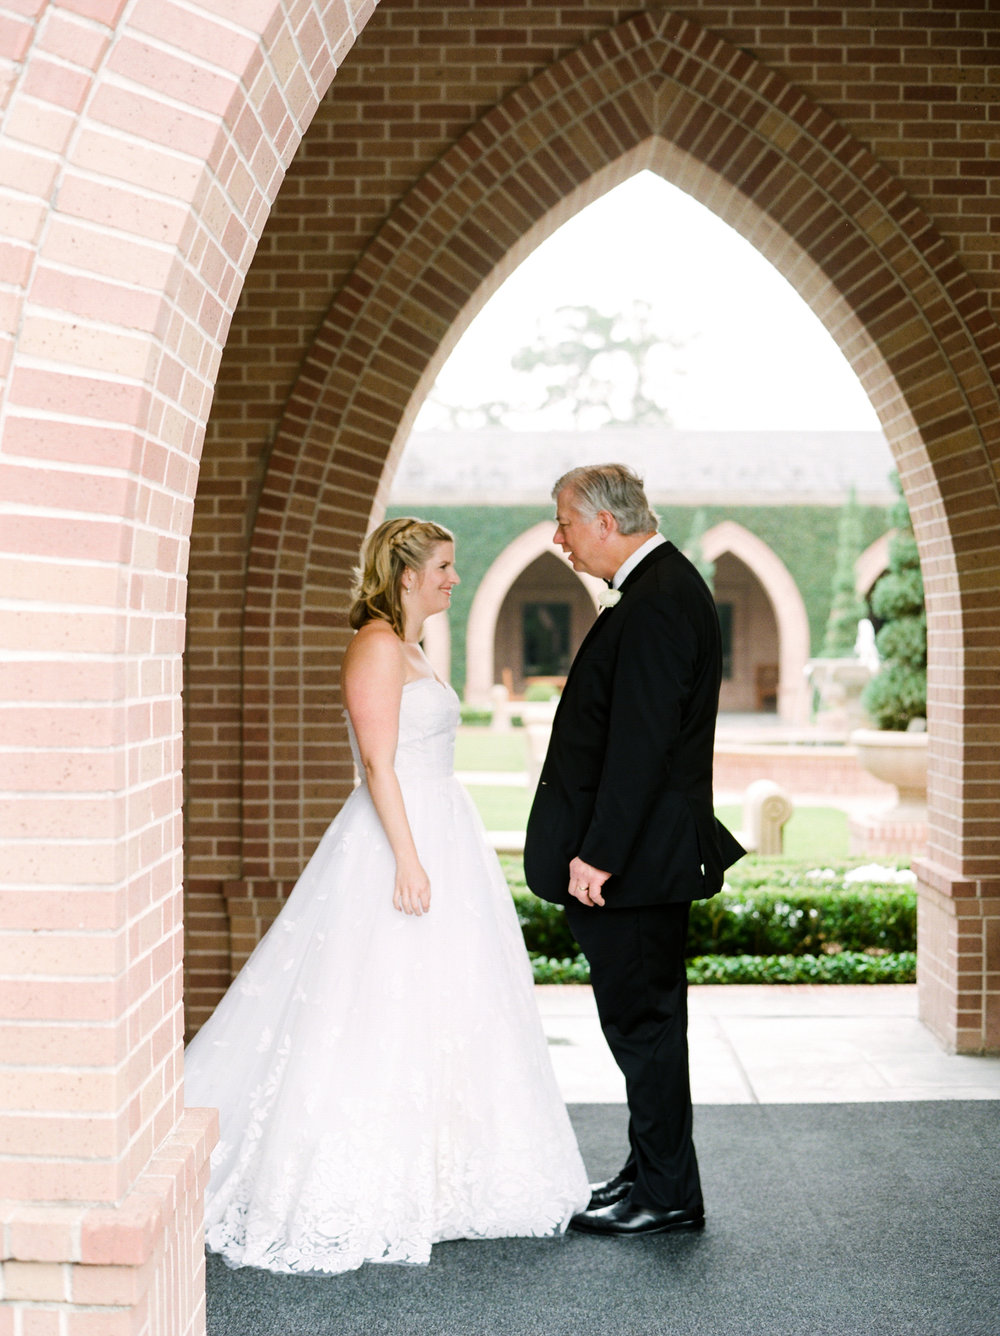 0011_St_Martin_Houston_Wedding_The_Astorian.jpg